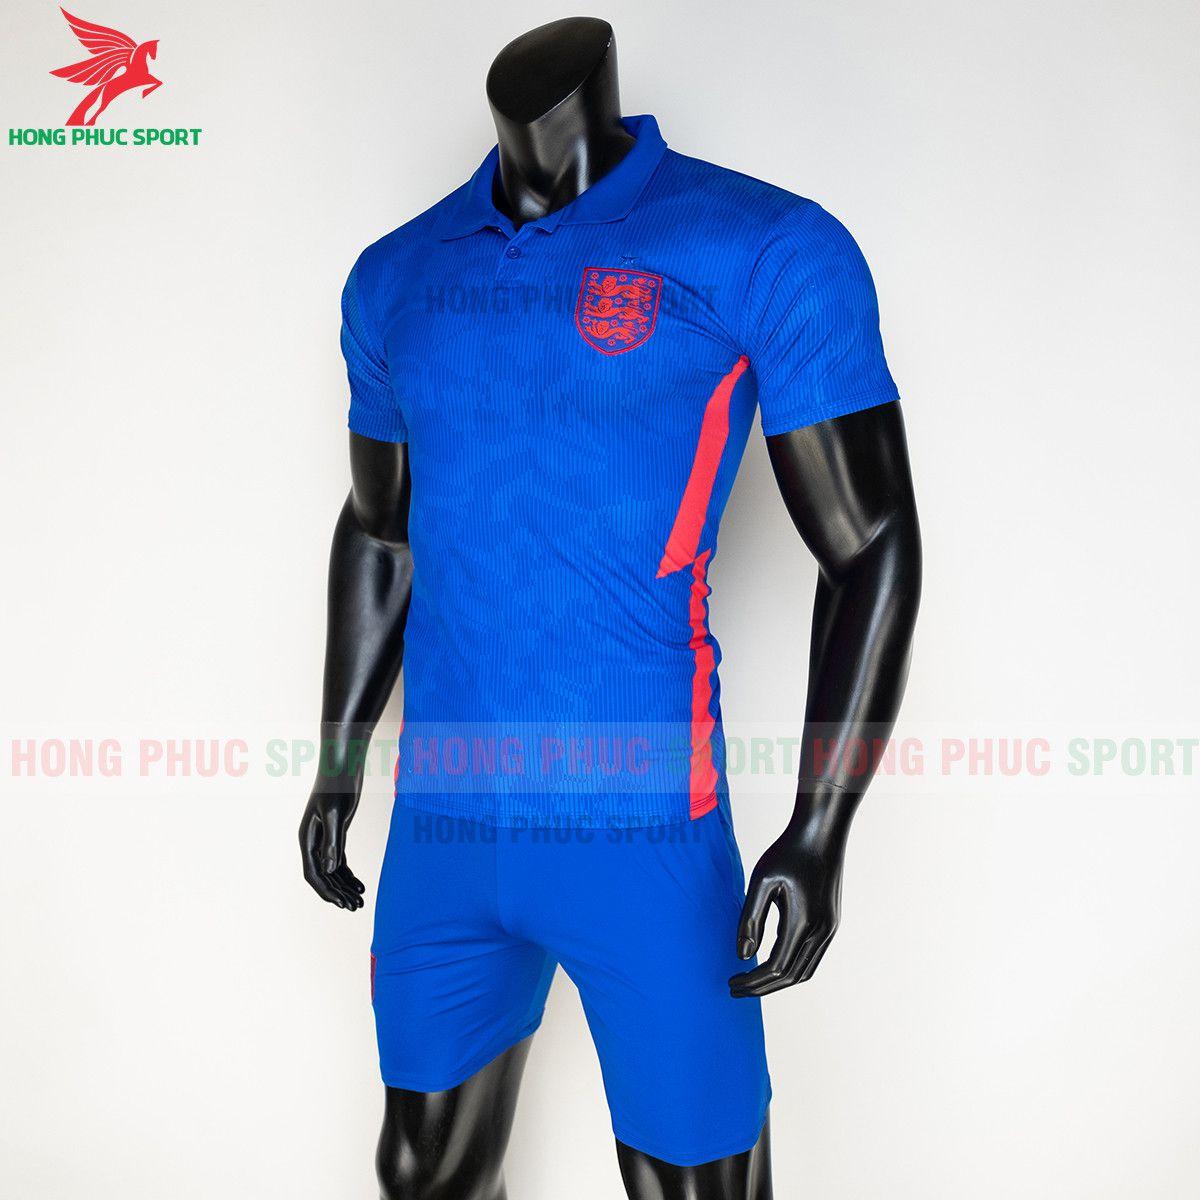 https://cdn.hongphucsport.com/unsafe/s4.shopbay.vn/files/285/ao-bong-da-tuyen-anh-euro-2021-san-khach-thun-lanh-4-61558aaa68107.jpg